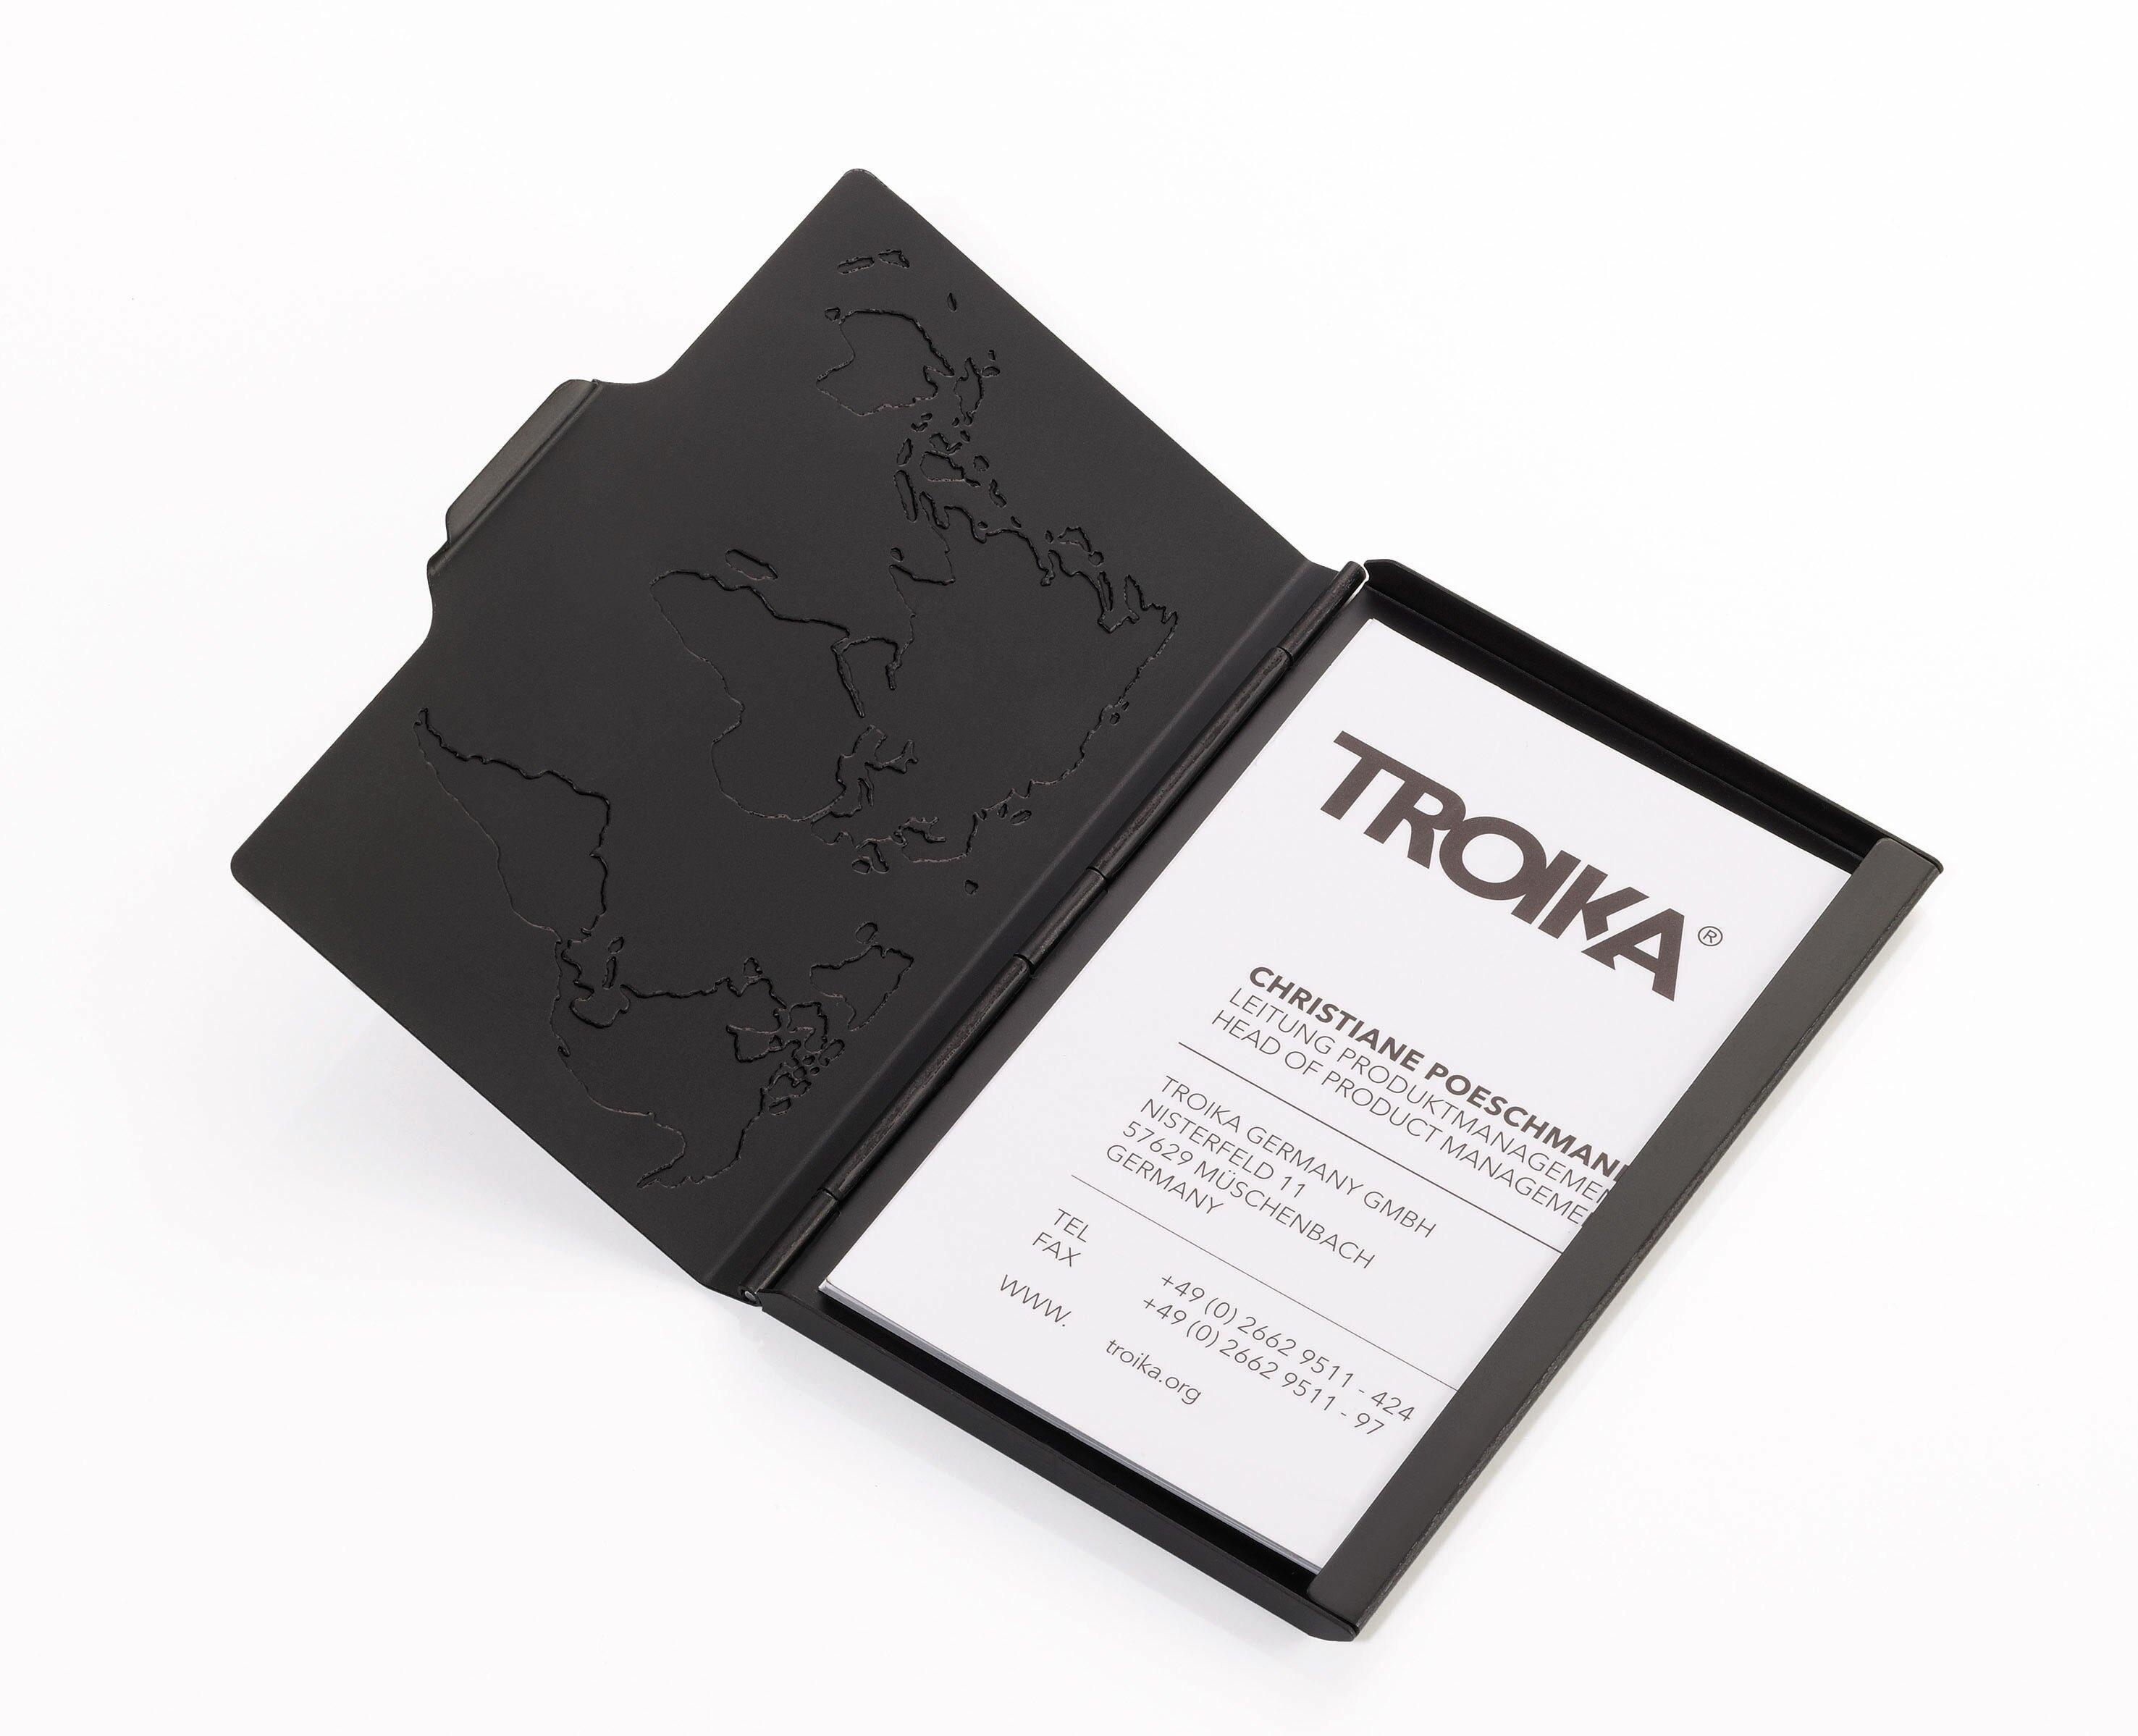 TROIKA 世界地圖輕巧名片夾(黑色)